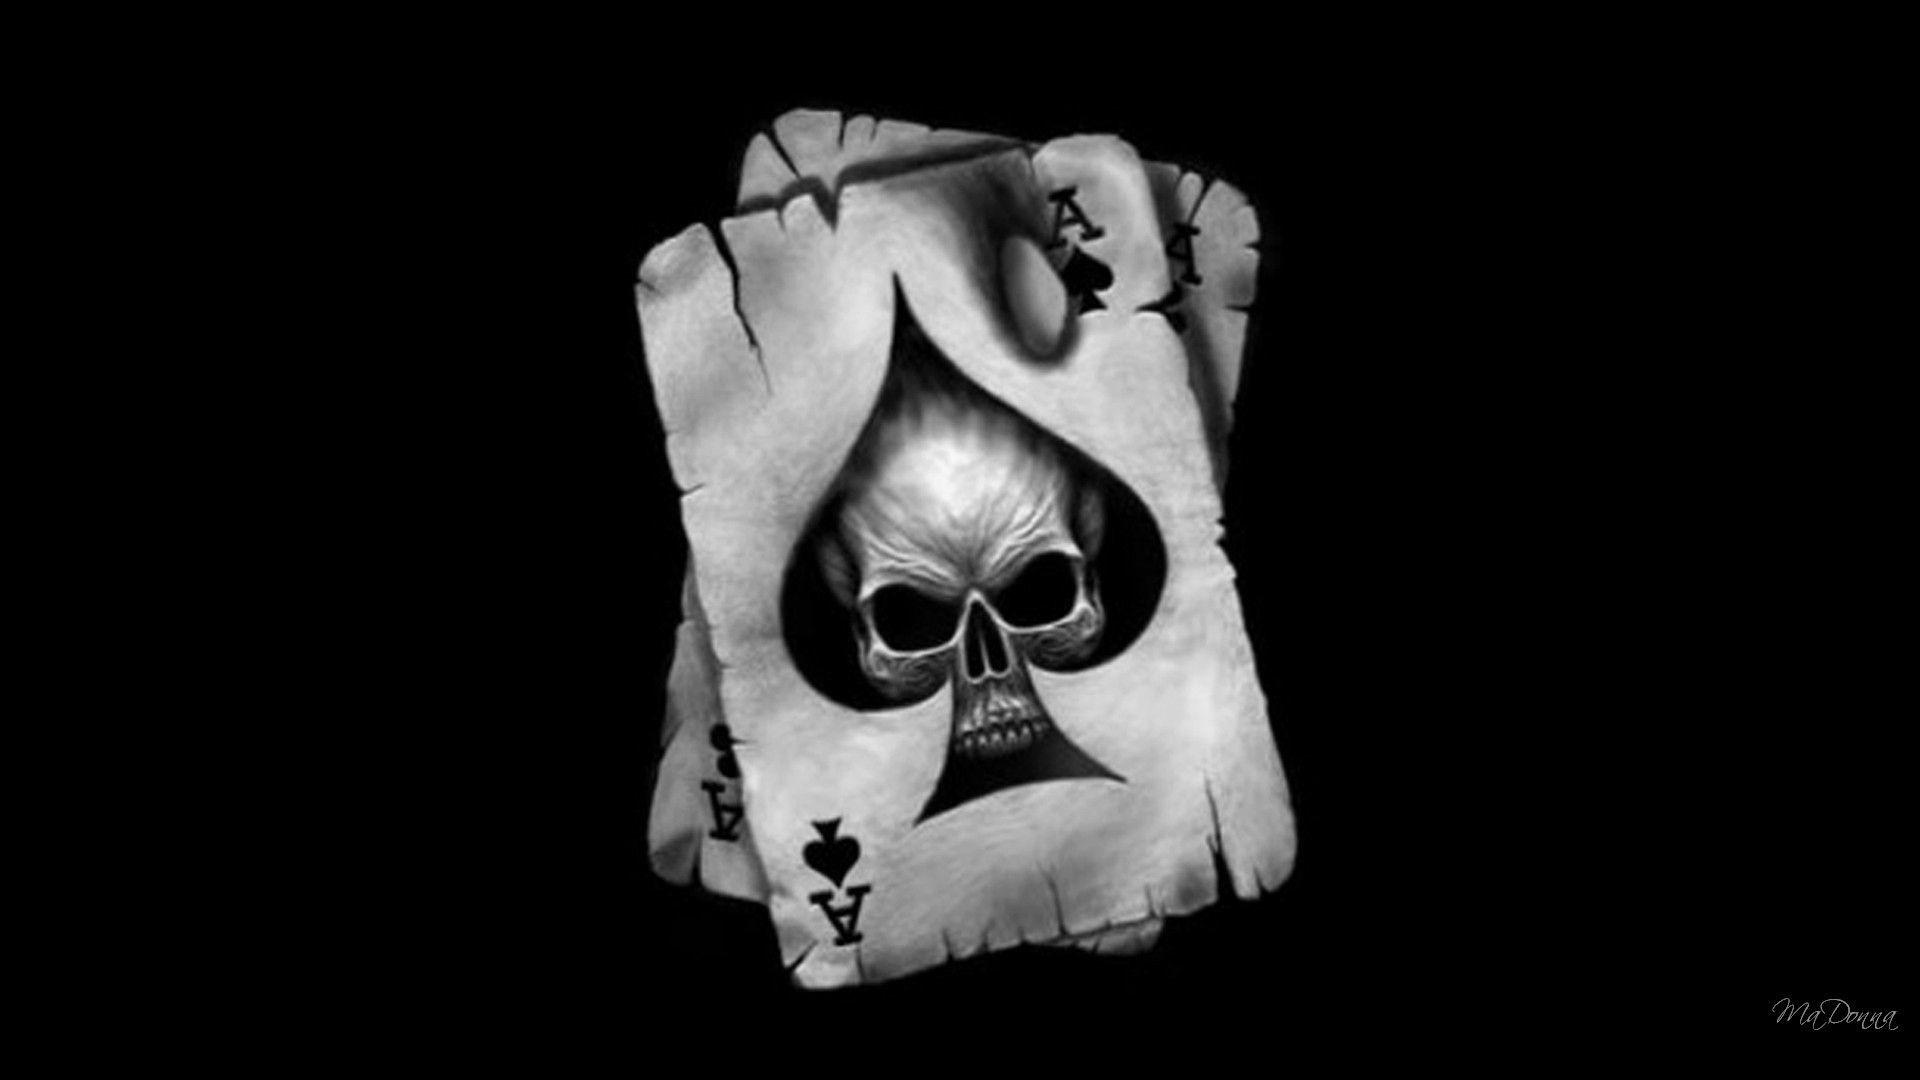 Harley Skull Wallpaper 74 Images